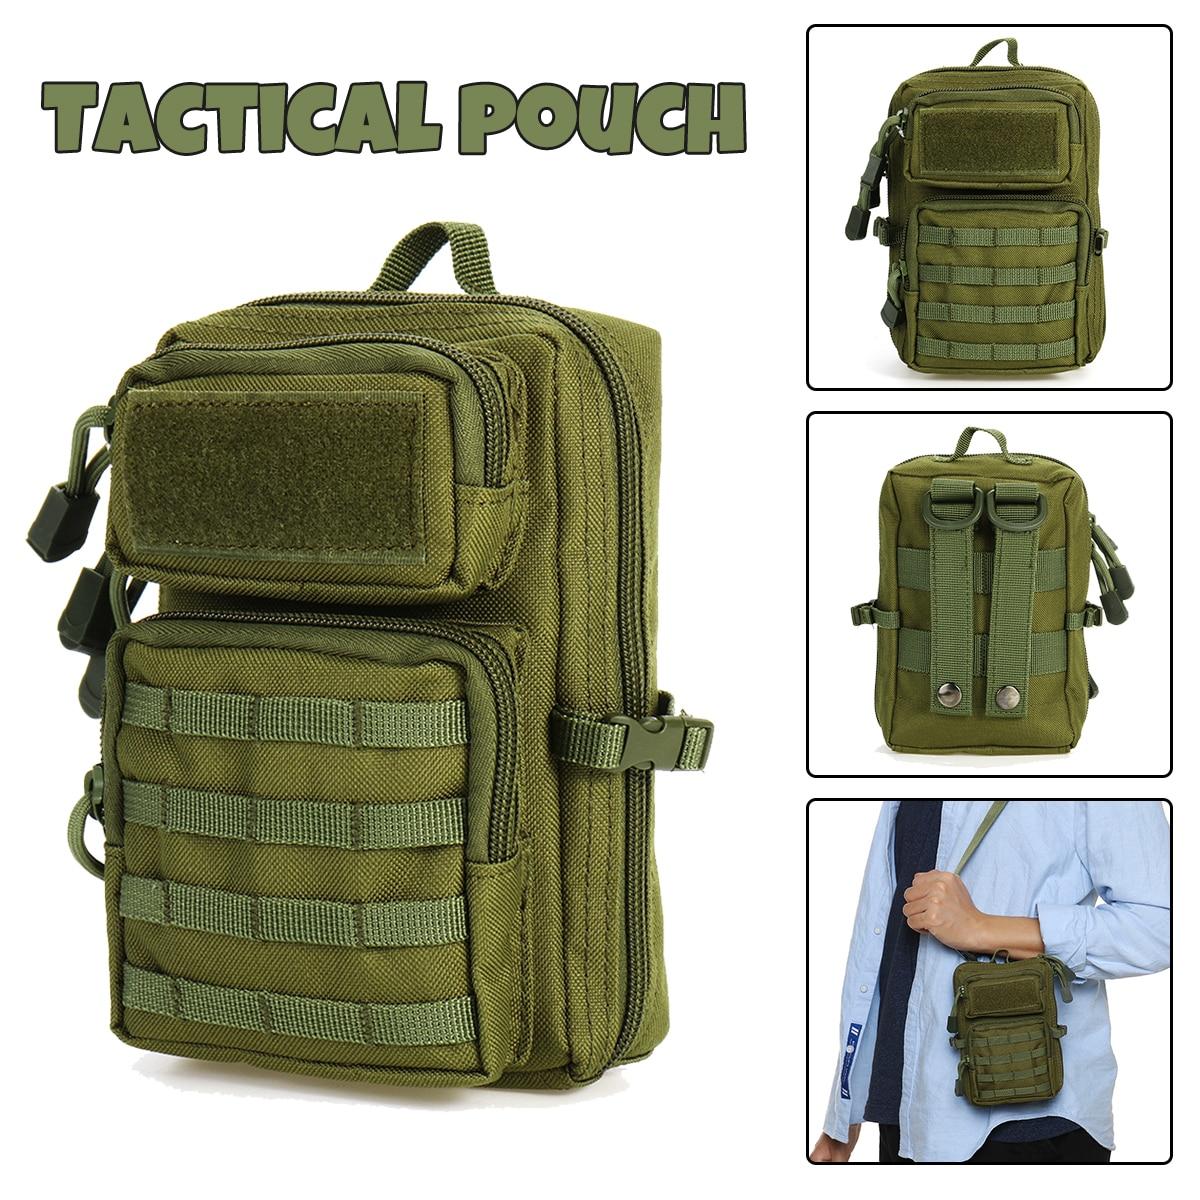 Universal Tactical Pouch Bag Holster Military Molle Hip Waist Belt Bag Zipper Wallet Pouch Purse Phone Case Camping Hiking Bags